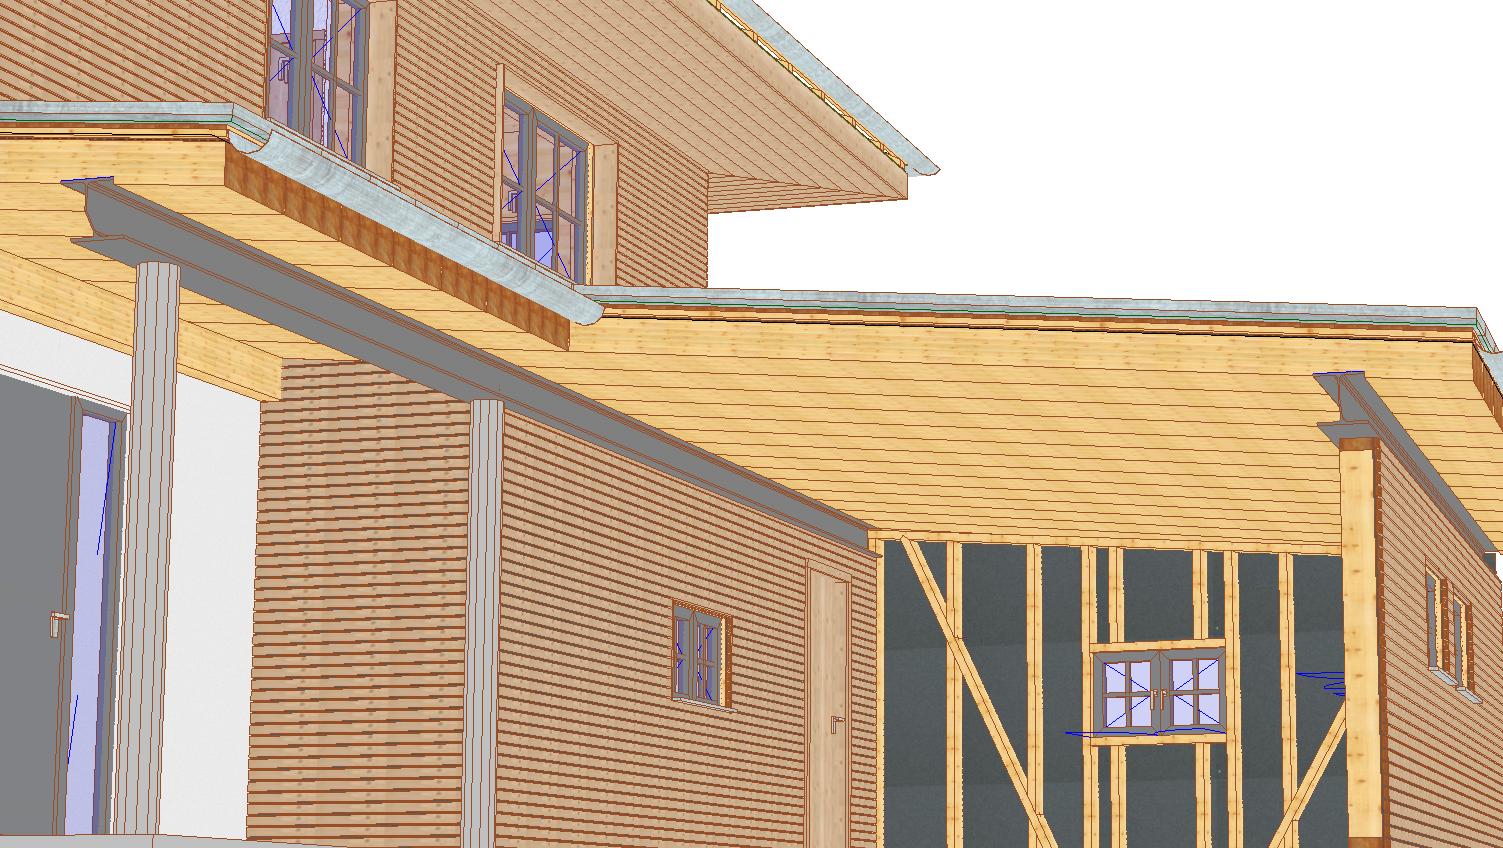 VISKON V15 3D-CAD/CAM HOLZRAHMENBAU | Sektor B - Jahresmiete mit Softwarepflege & Wartung